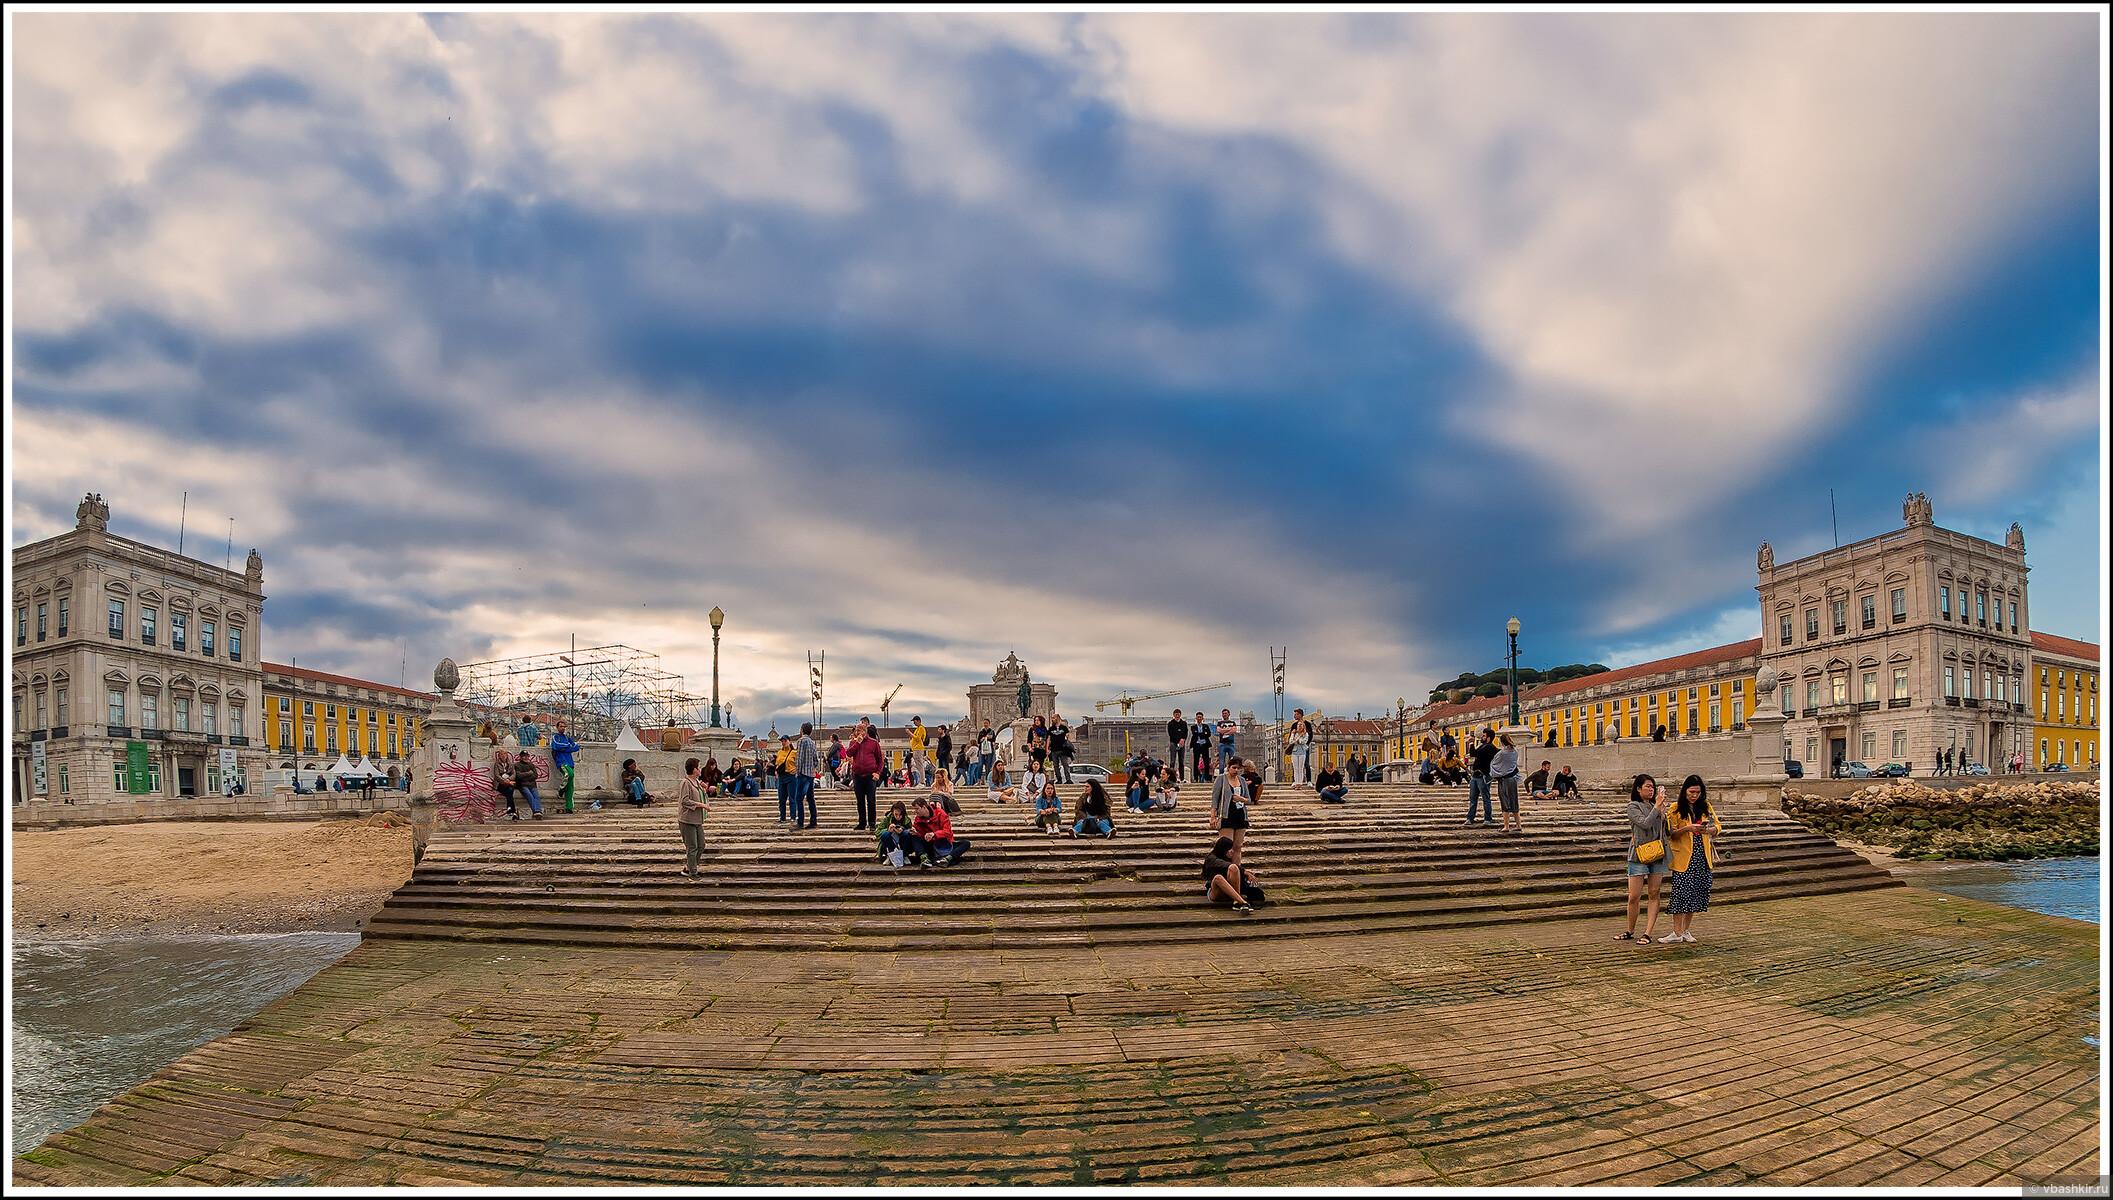 Лиссабон. Вид на площадь Коммерции от причала., Я и лаг у троп. Португалия! (палиндром)